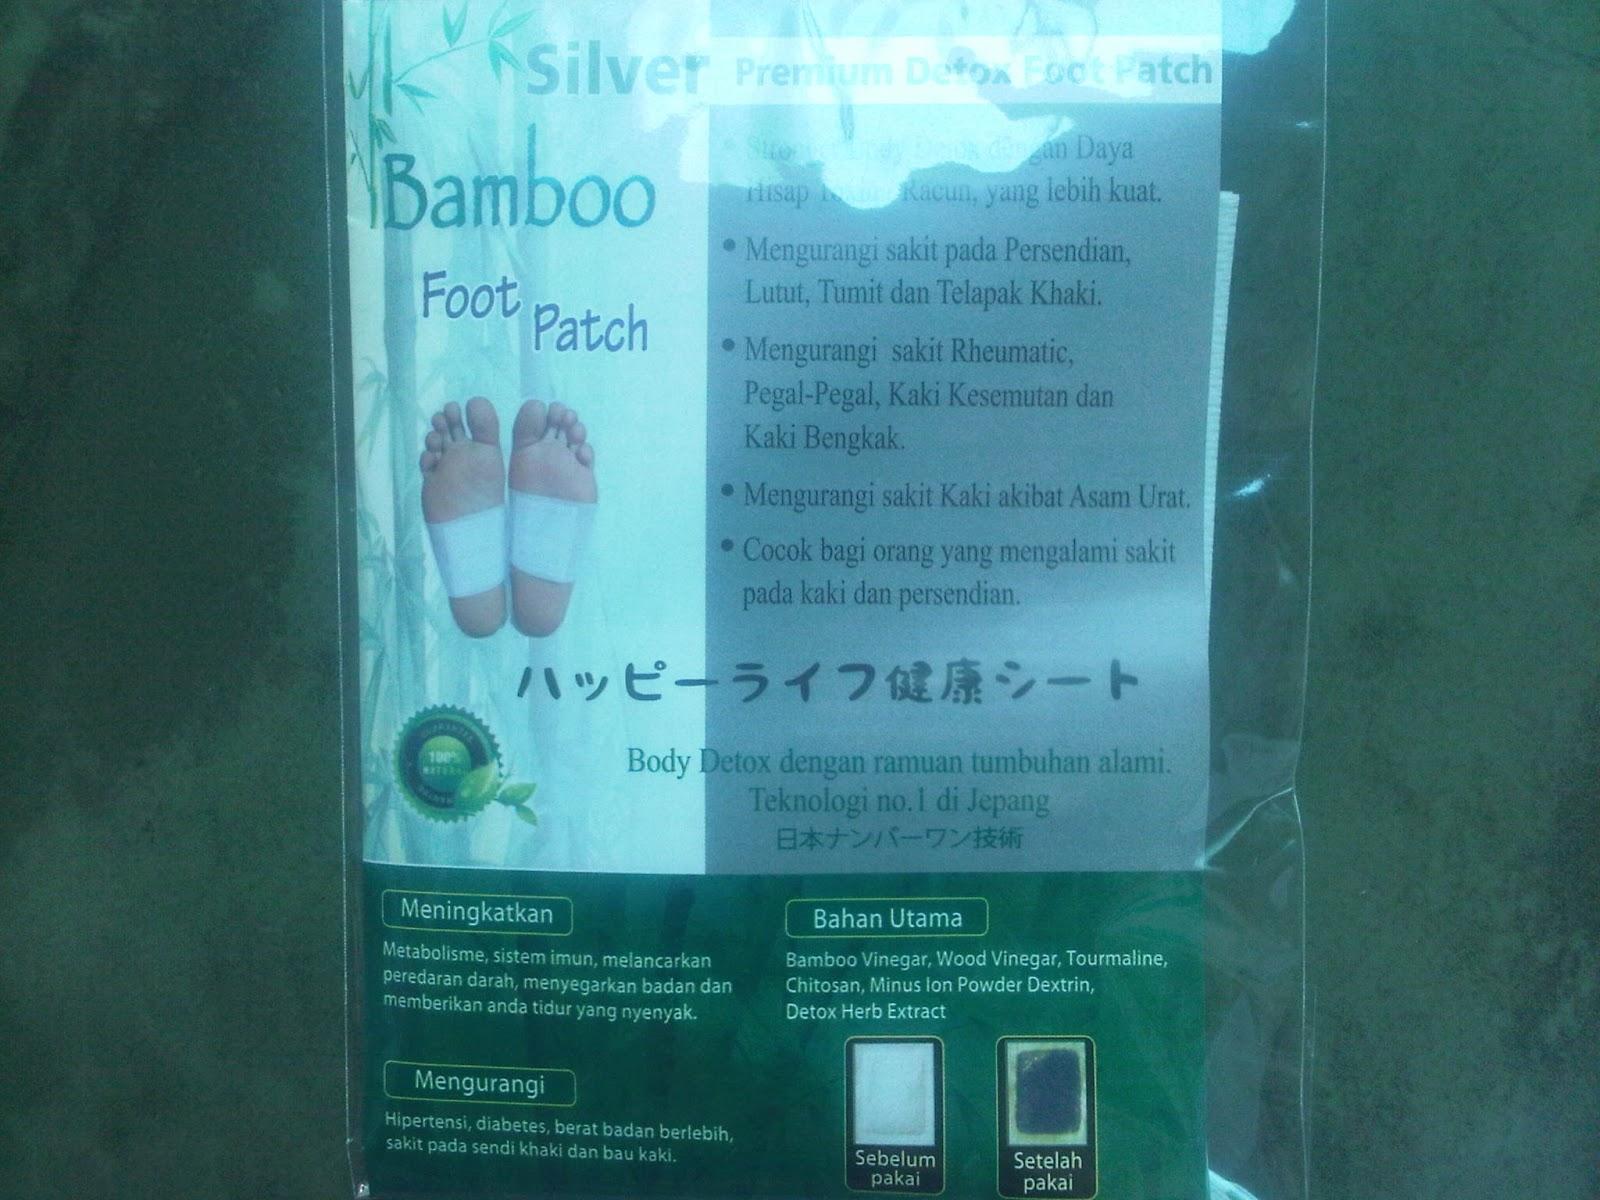 Grosir Koyo Kaki Paling Murah Di Indonesia List Jenis Dan Penyerap Racun Tubuh Detox Foot Patch Gold Original Bamboo Harga